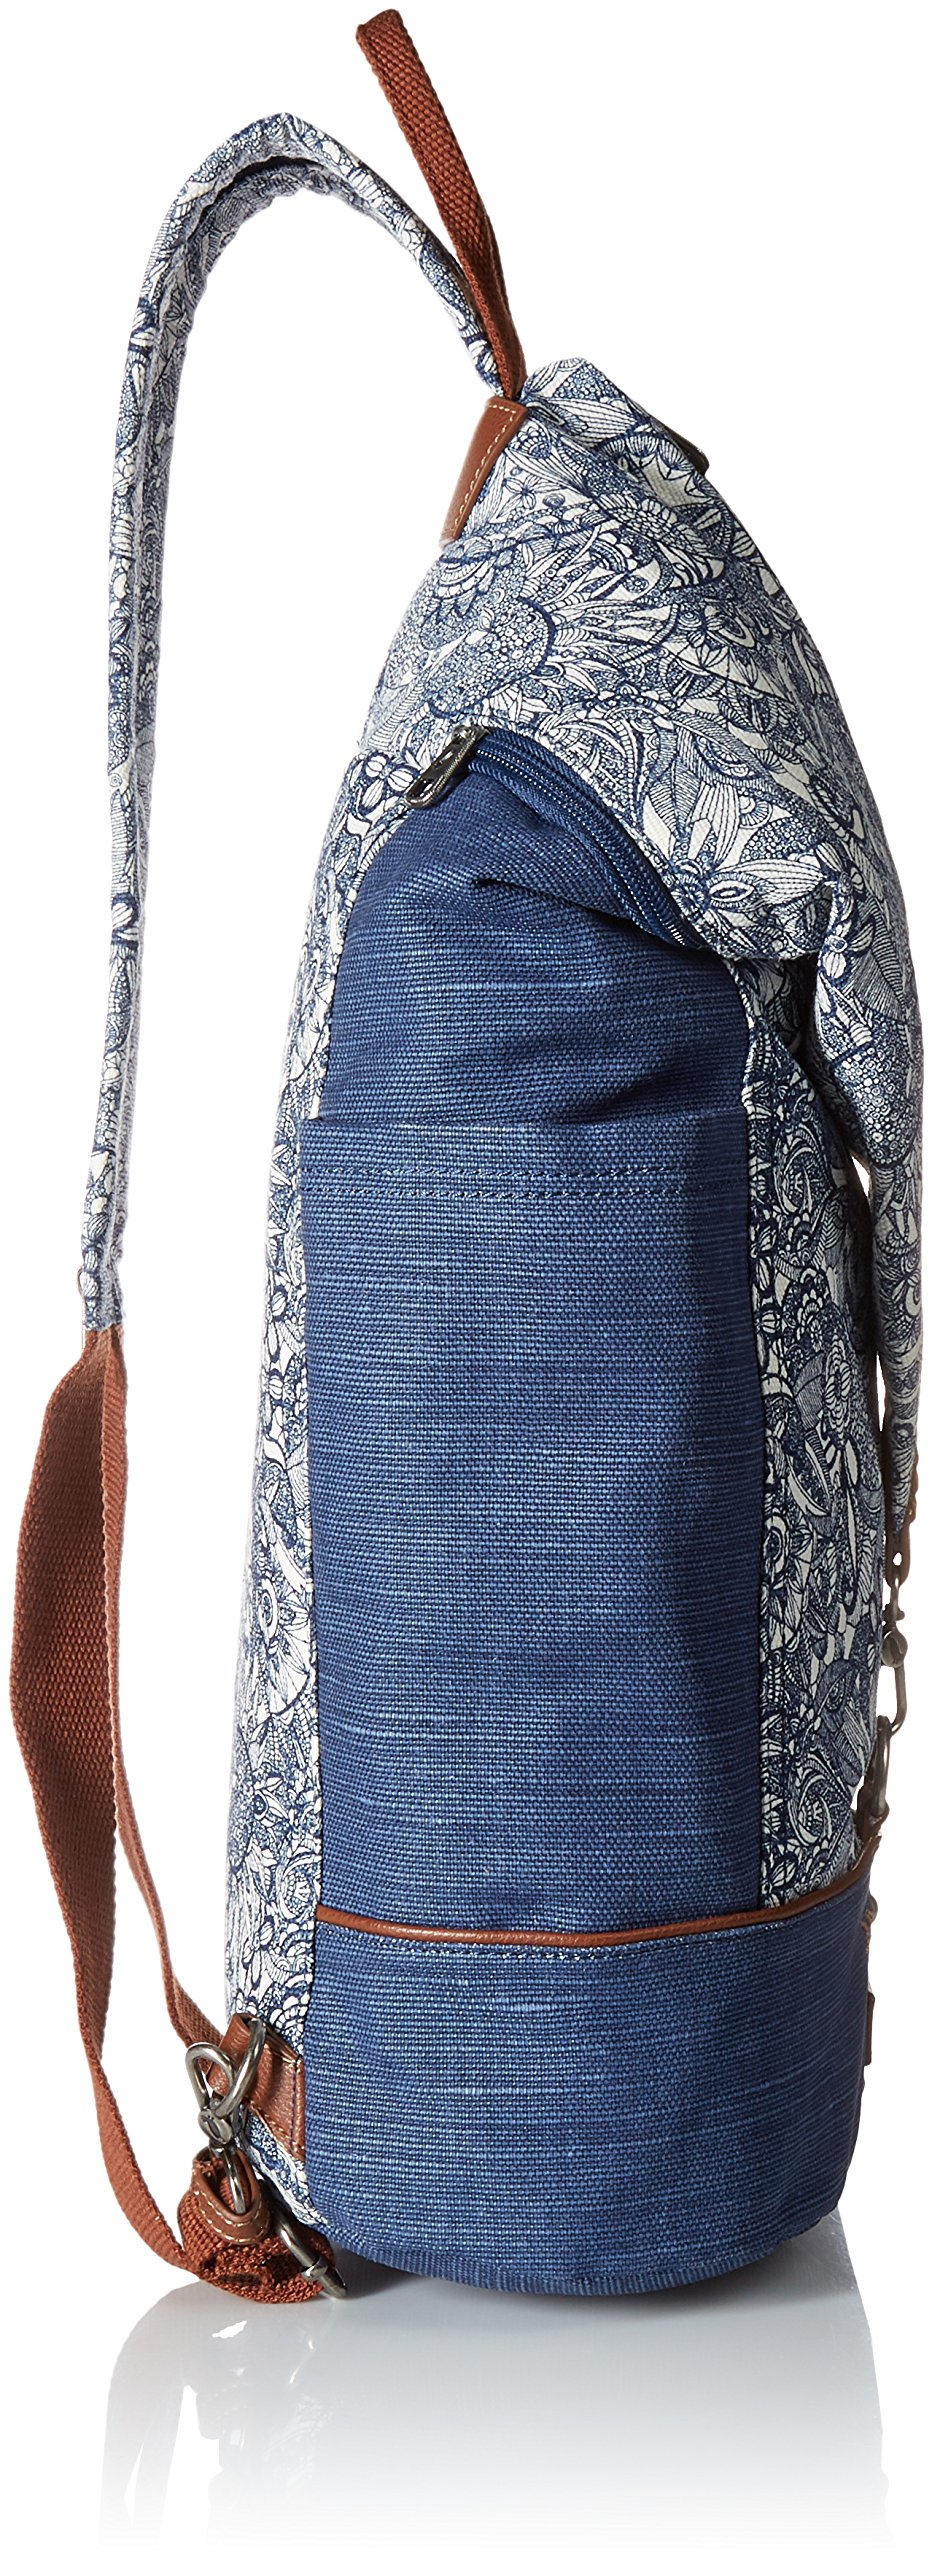 Sakroots City Backpack, Navy Spirit Desert, One Size by Sakroots (Image #3)